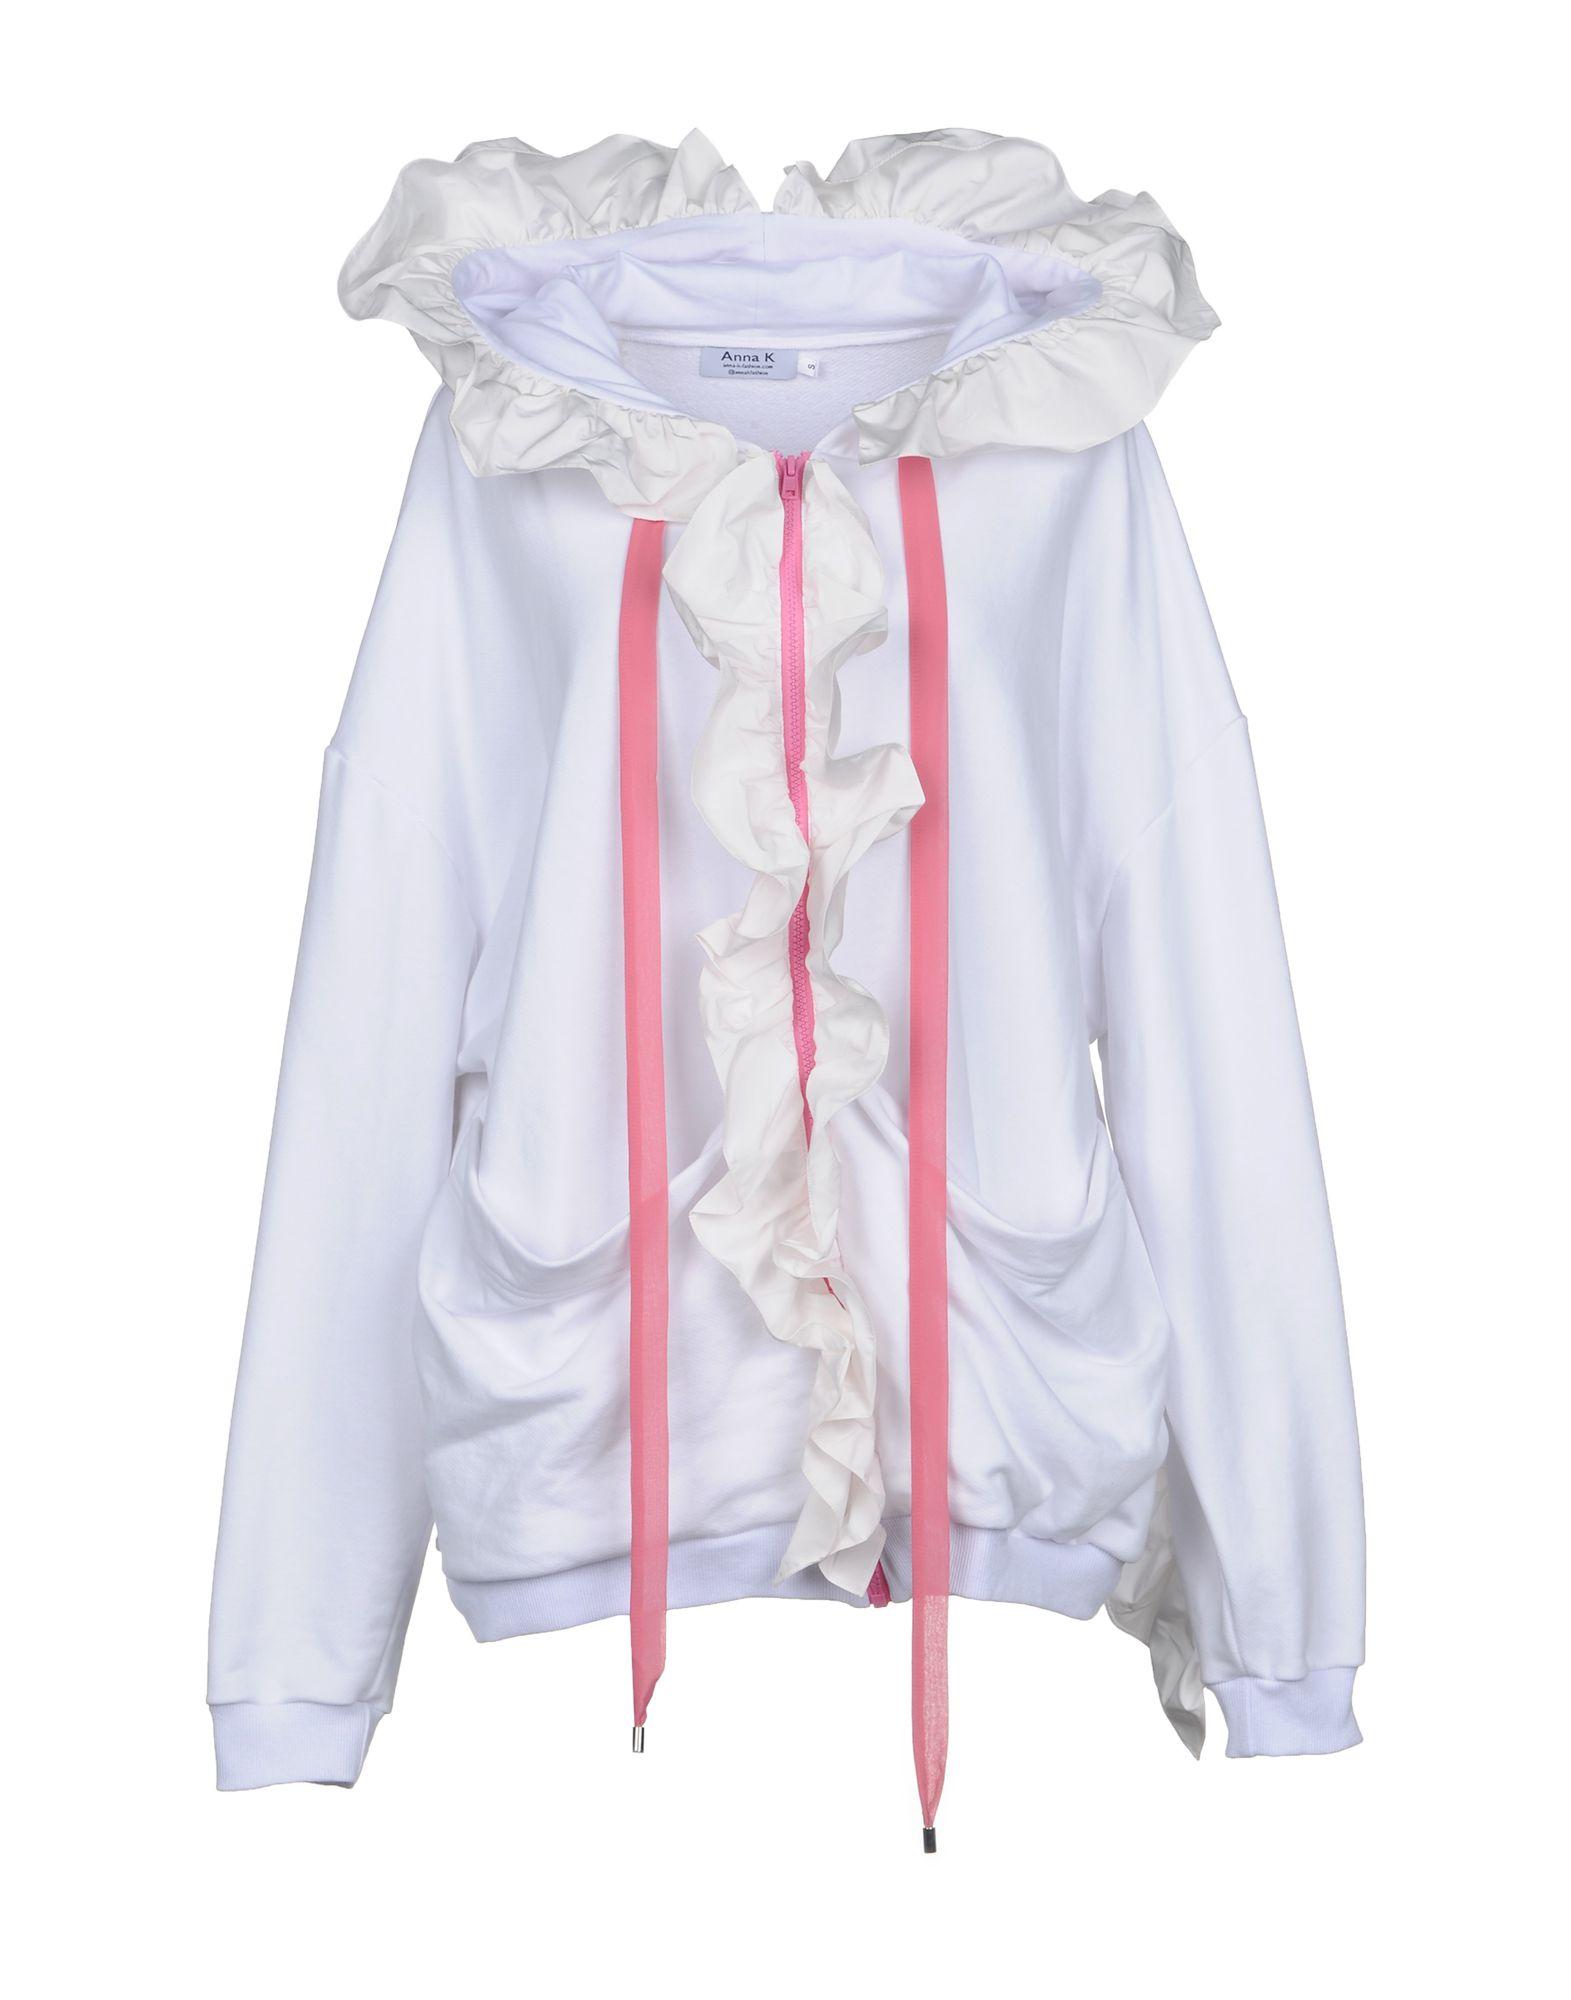 ANNAK Hooded Sweatshirt in White